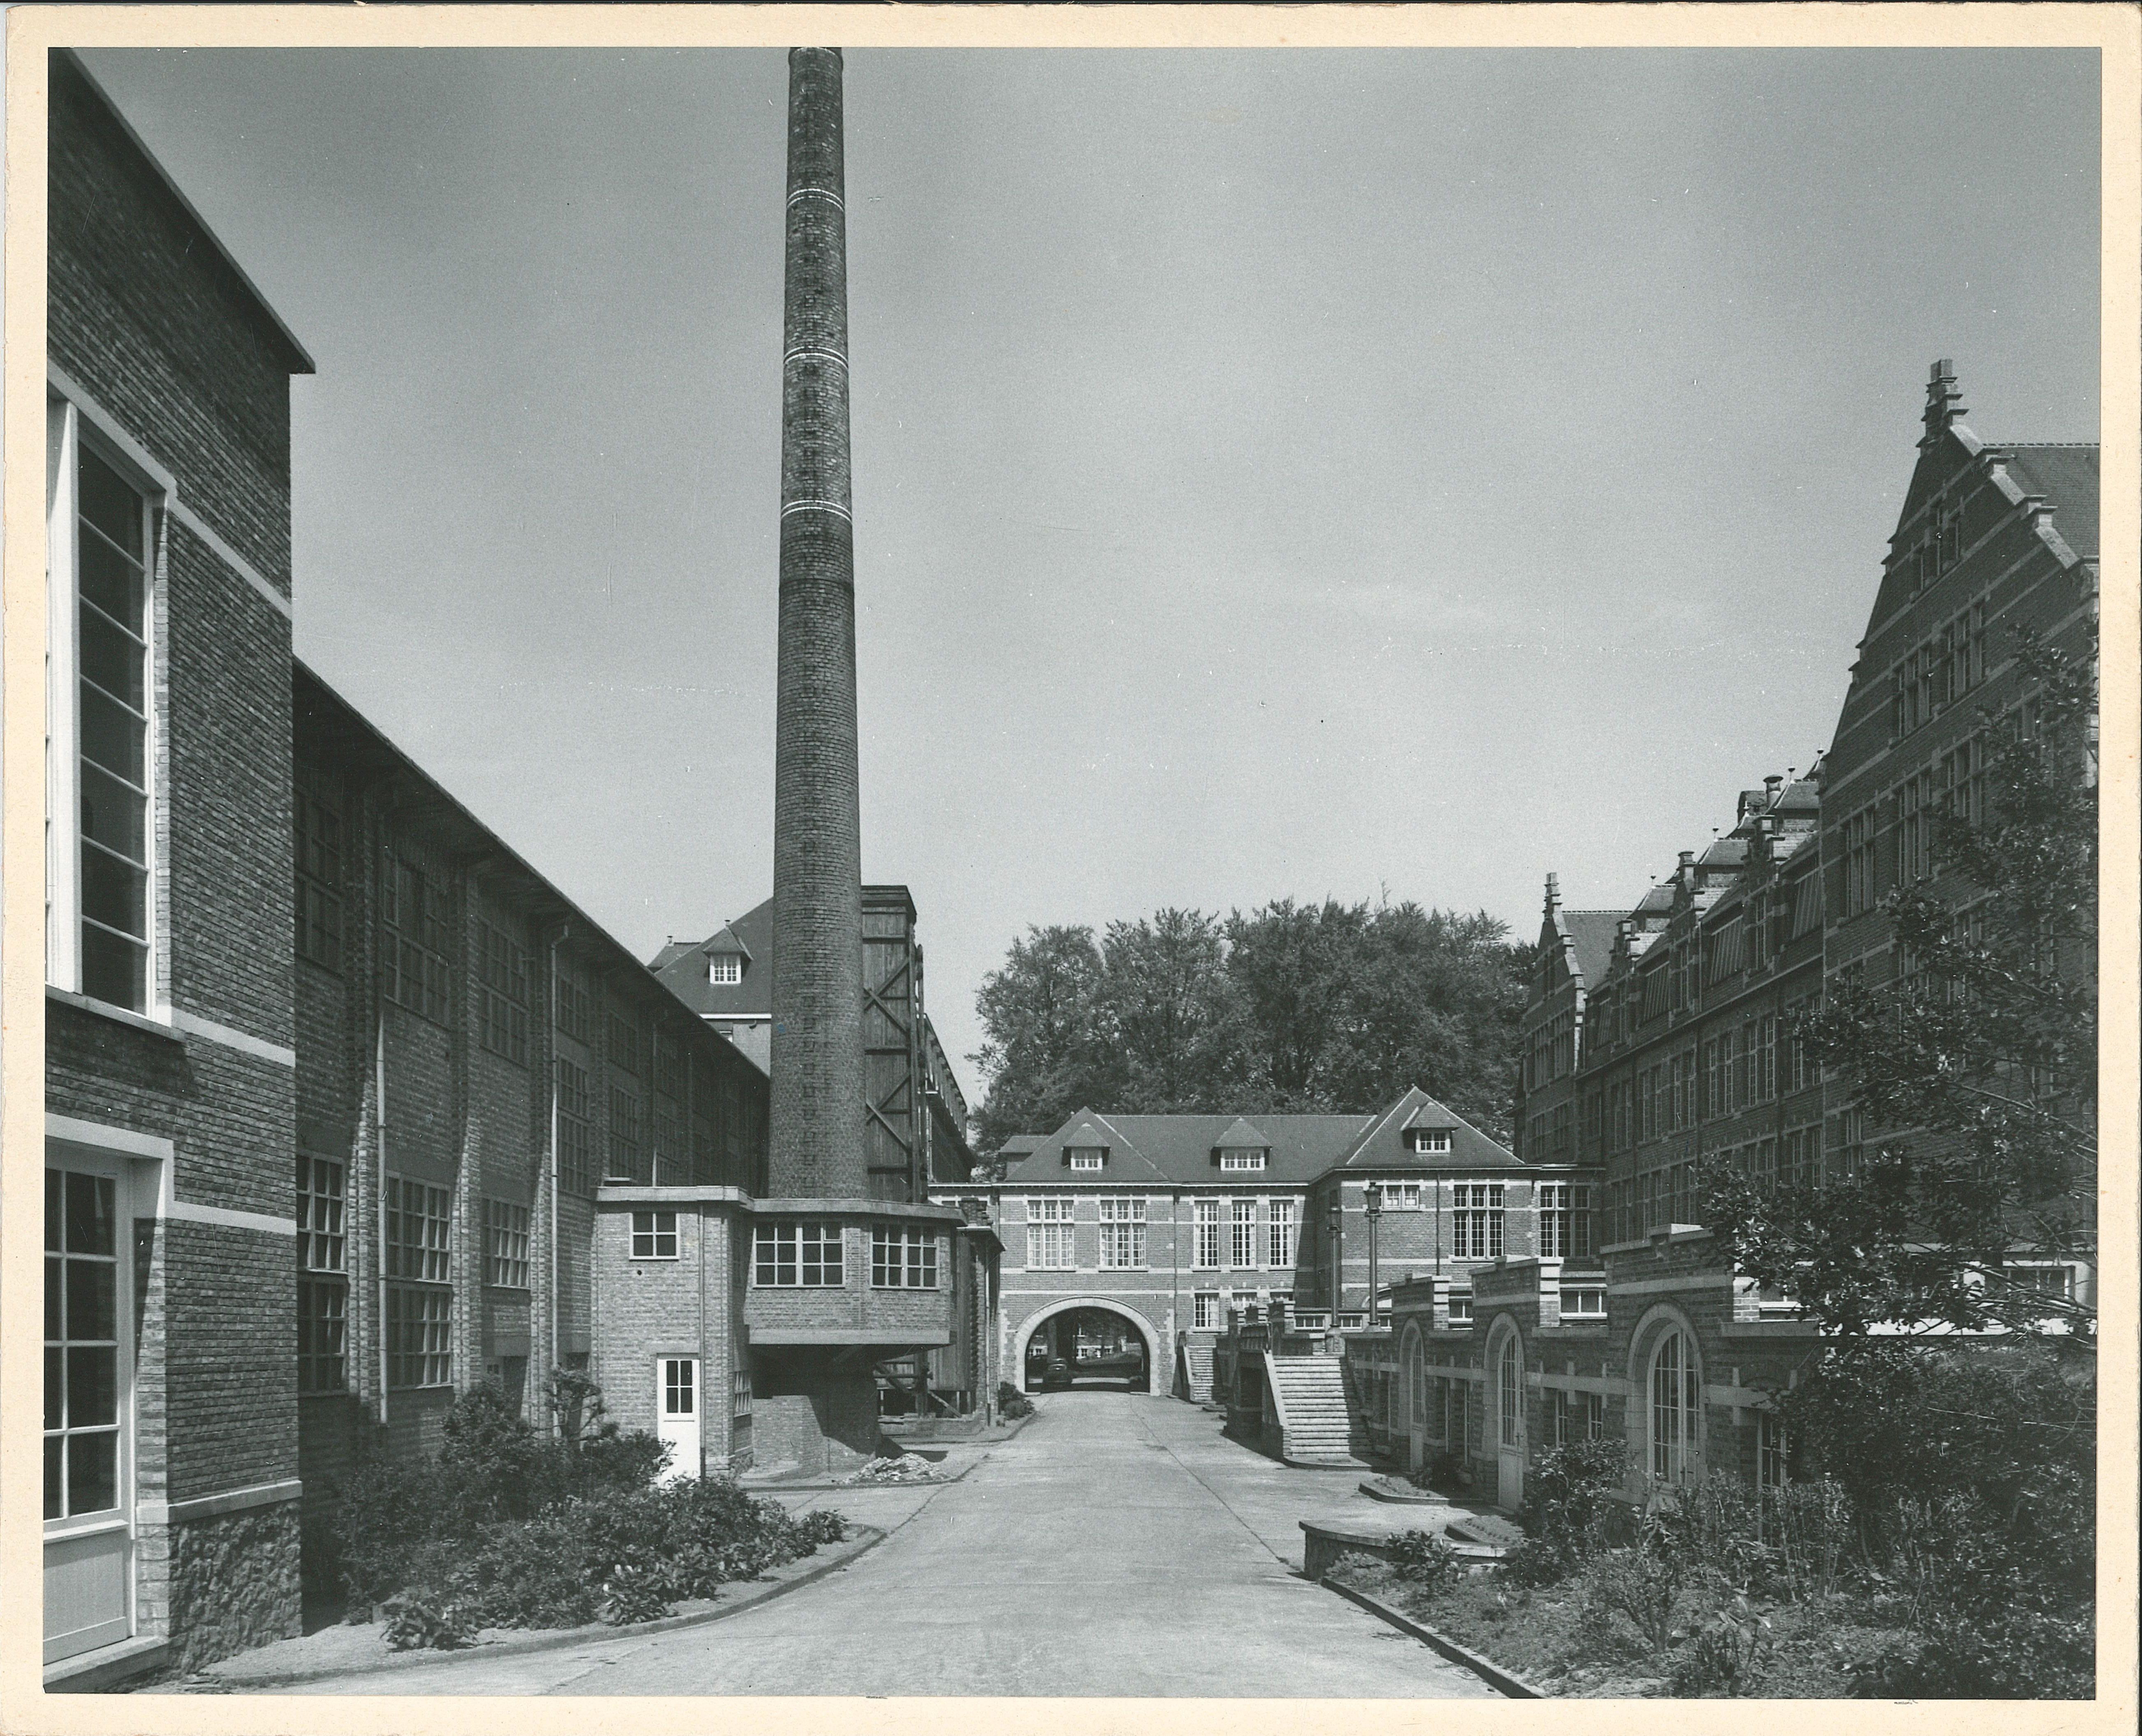 La Meuse Steam Turbine – Het Thermotechnisch Instituut